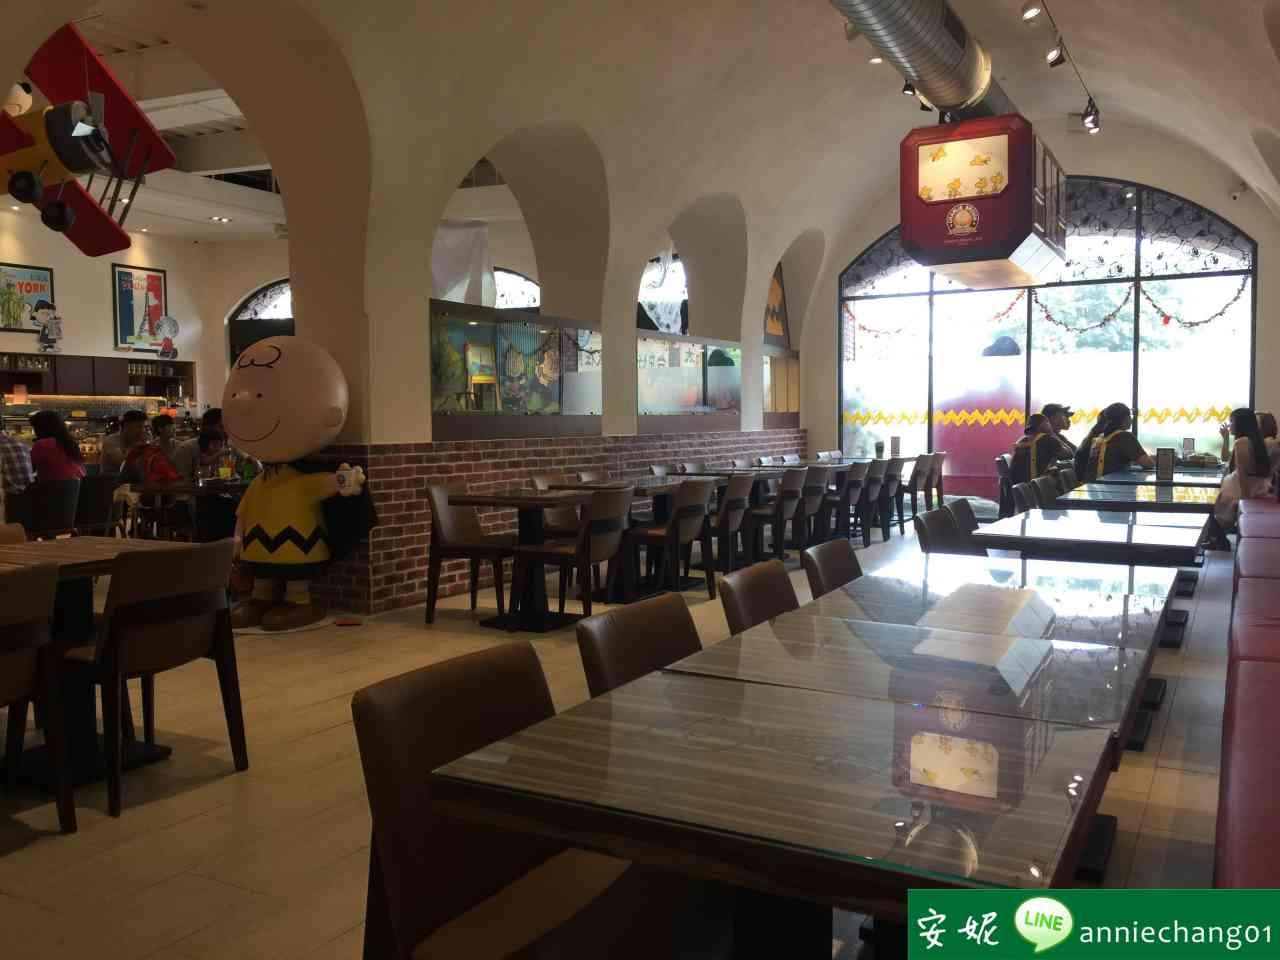 【台中】 查理布朗餐廳Charlie Brown Cafe